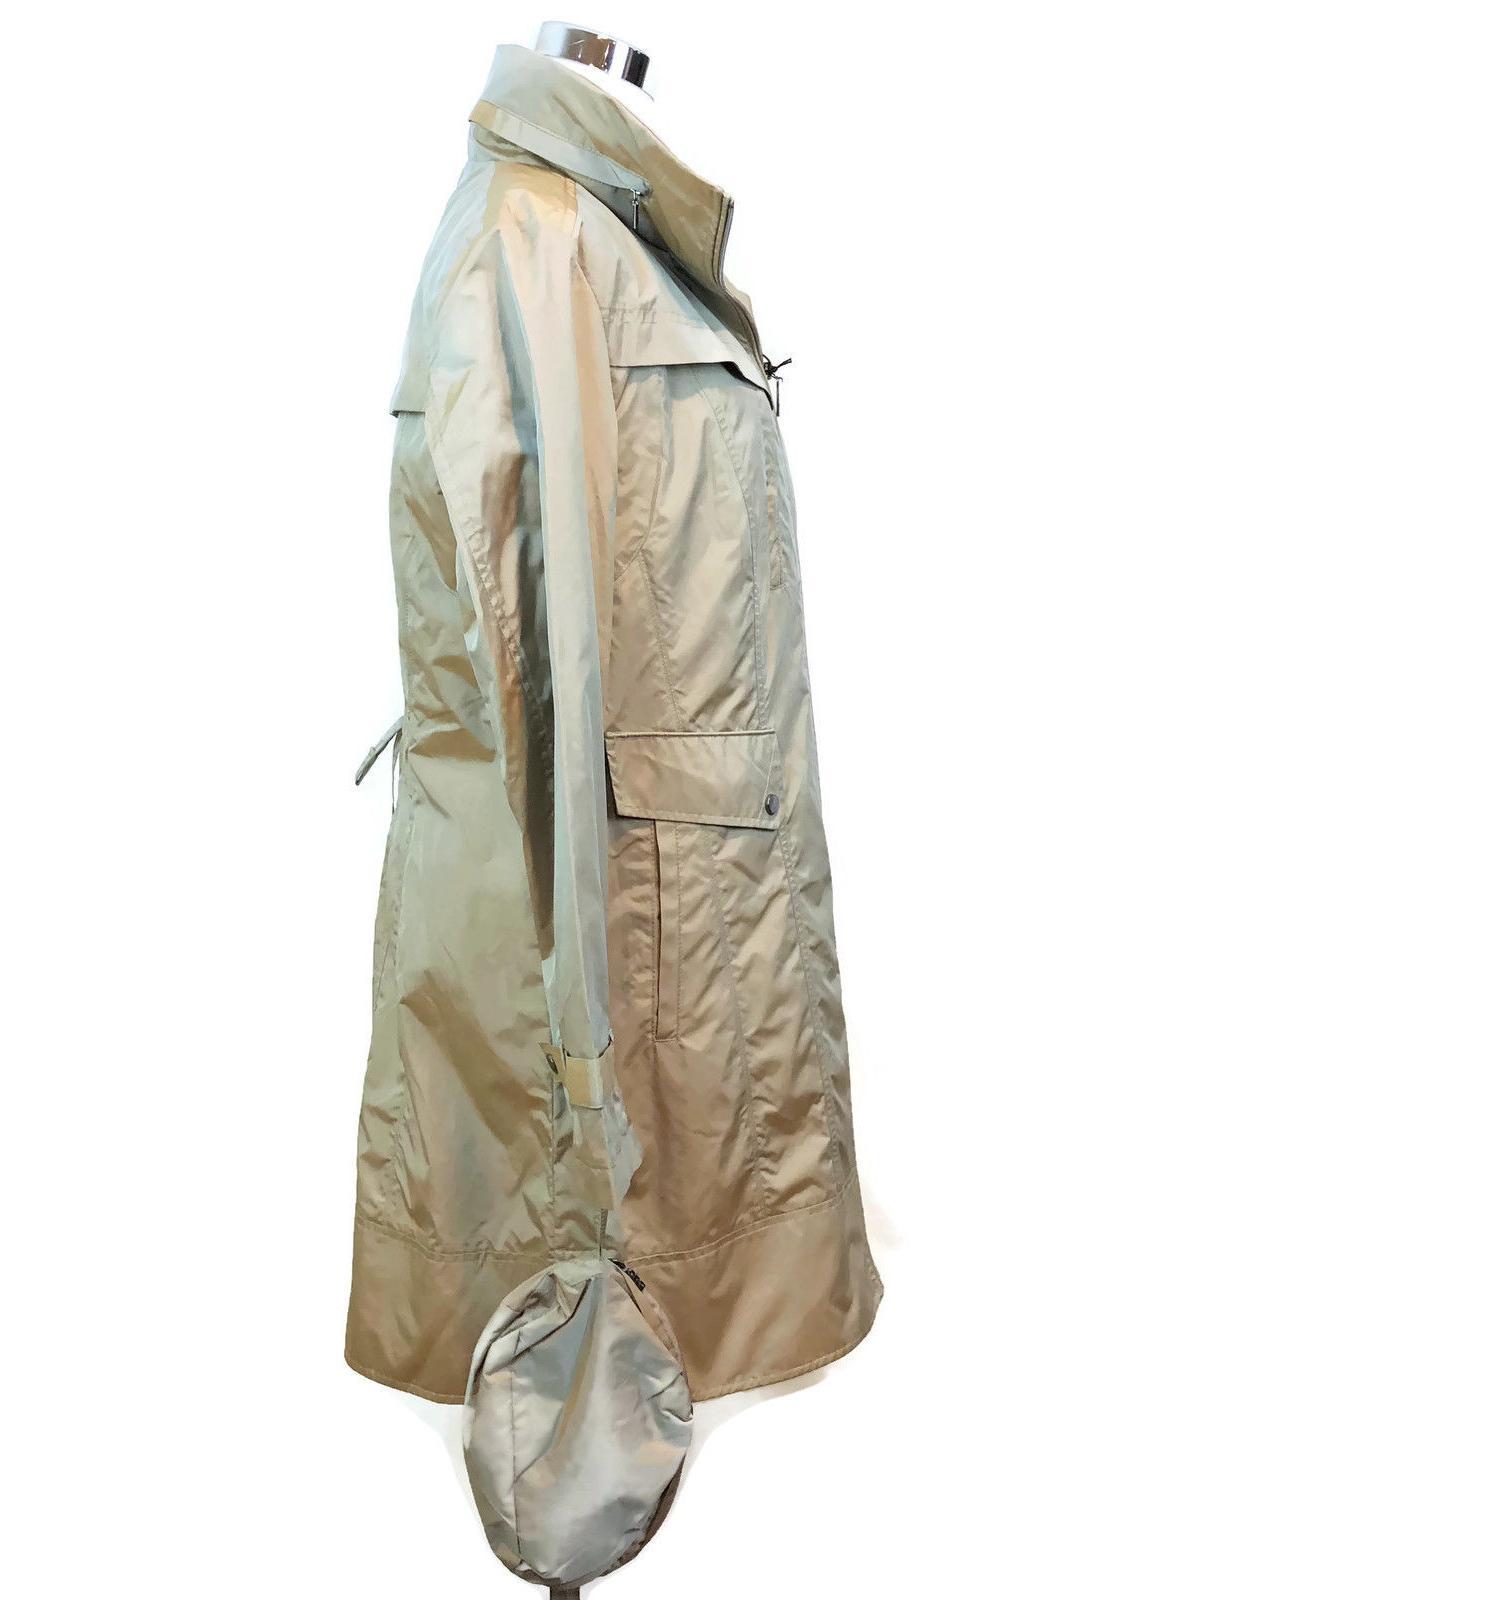 COLE Rain Coat Packable Bag NWT